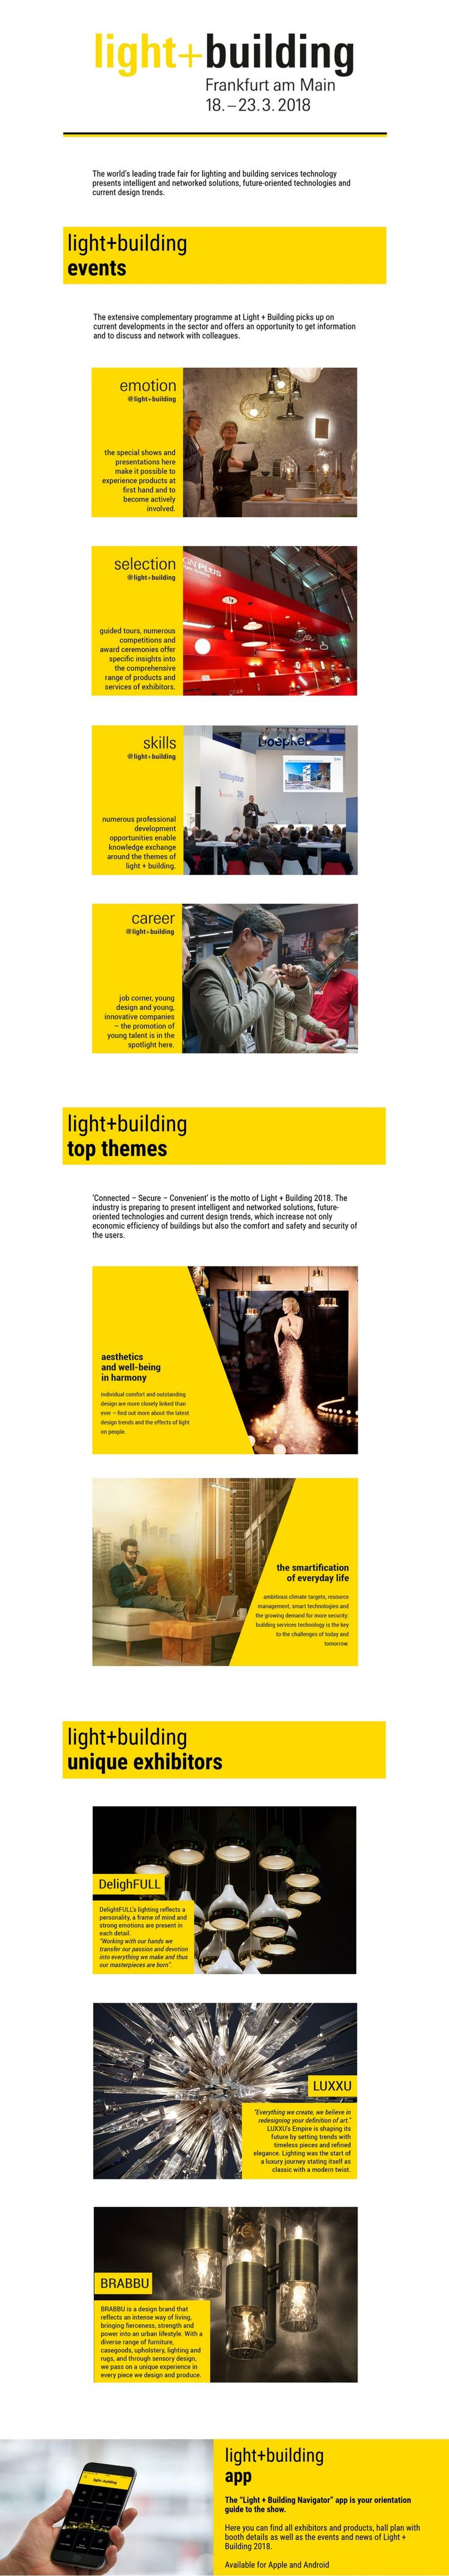 Light + Building – One of The Top Design Events of March #DesignEvent #LightBuilding #Frankfurt #Light #Design http://mydesignagenda.com/light-building-design-events-march/